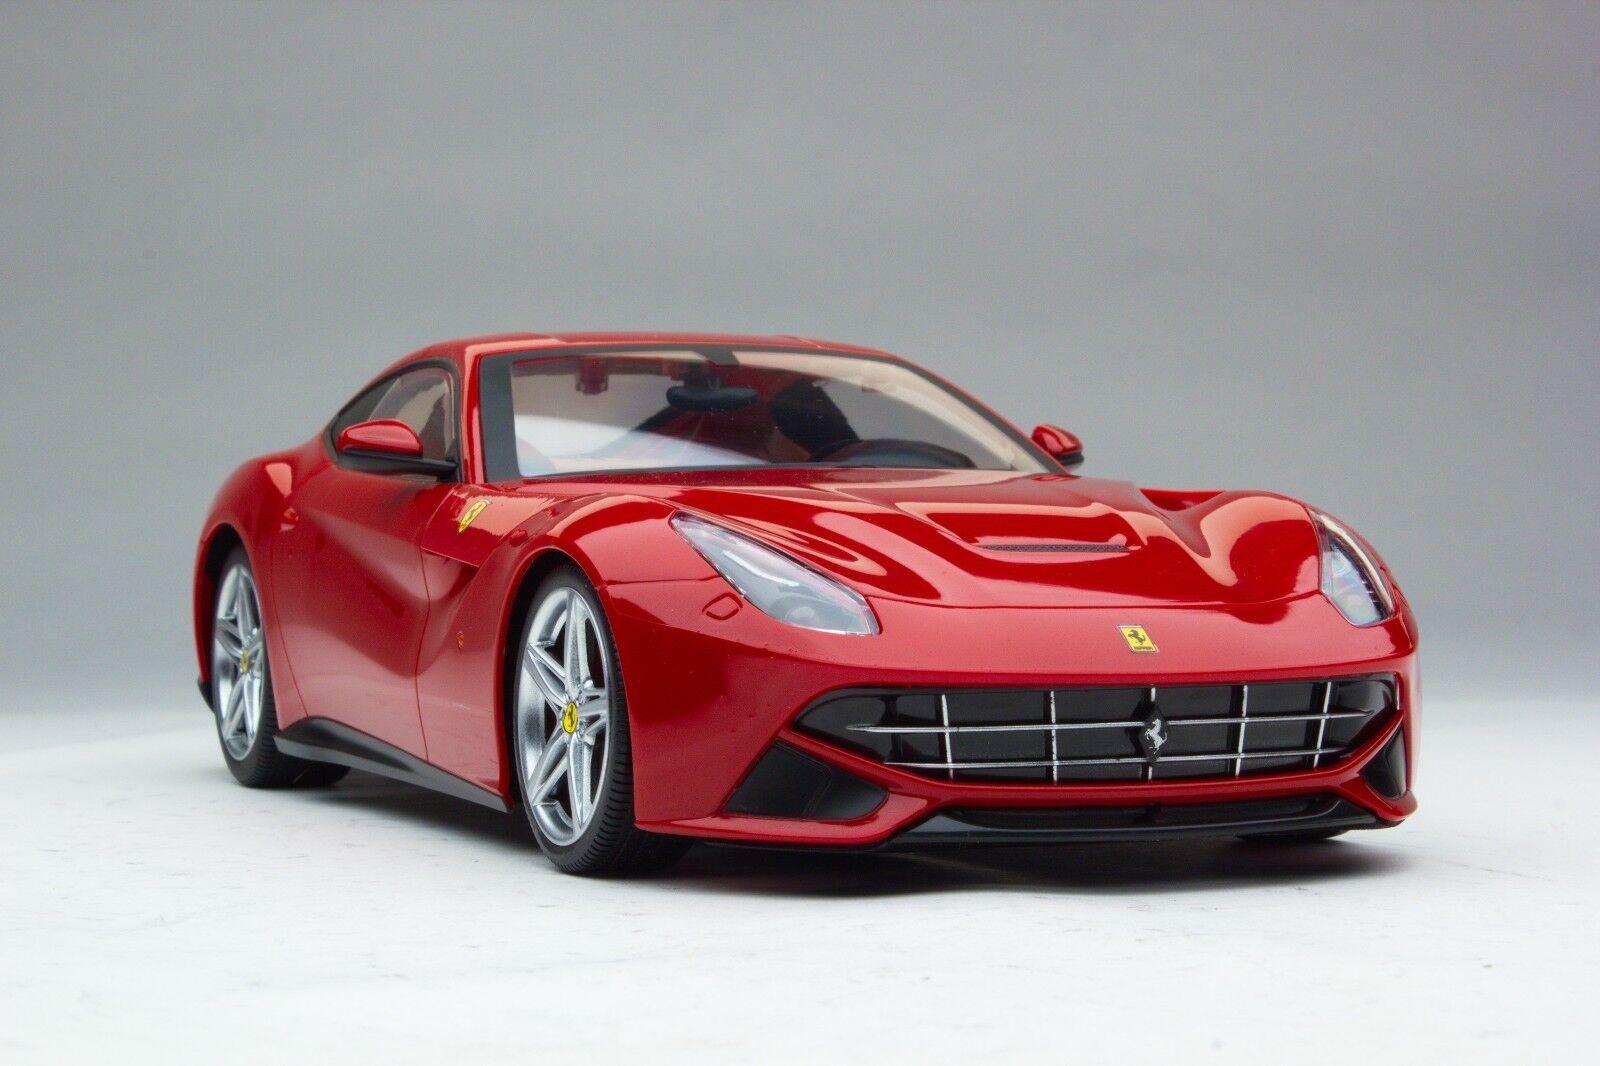 Ferrari F12 Berlinetta Qualità R C Vettura   Scala 1 14    Erc08507